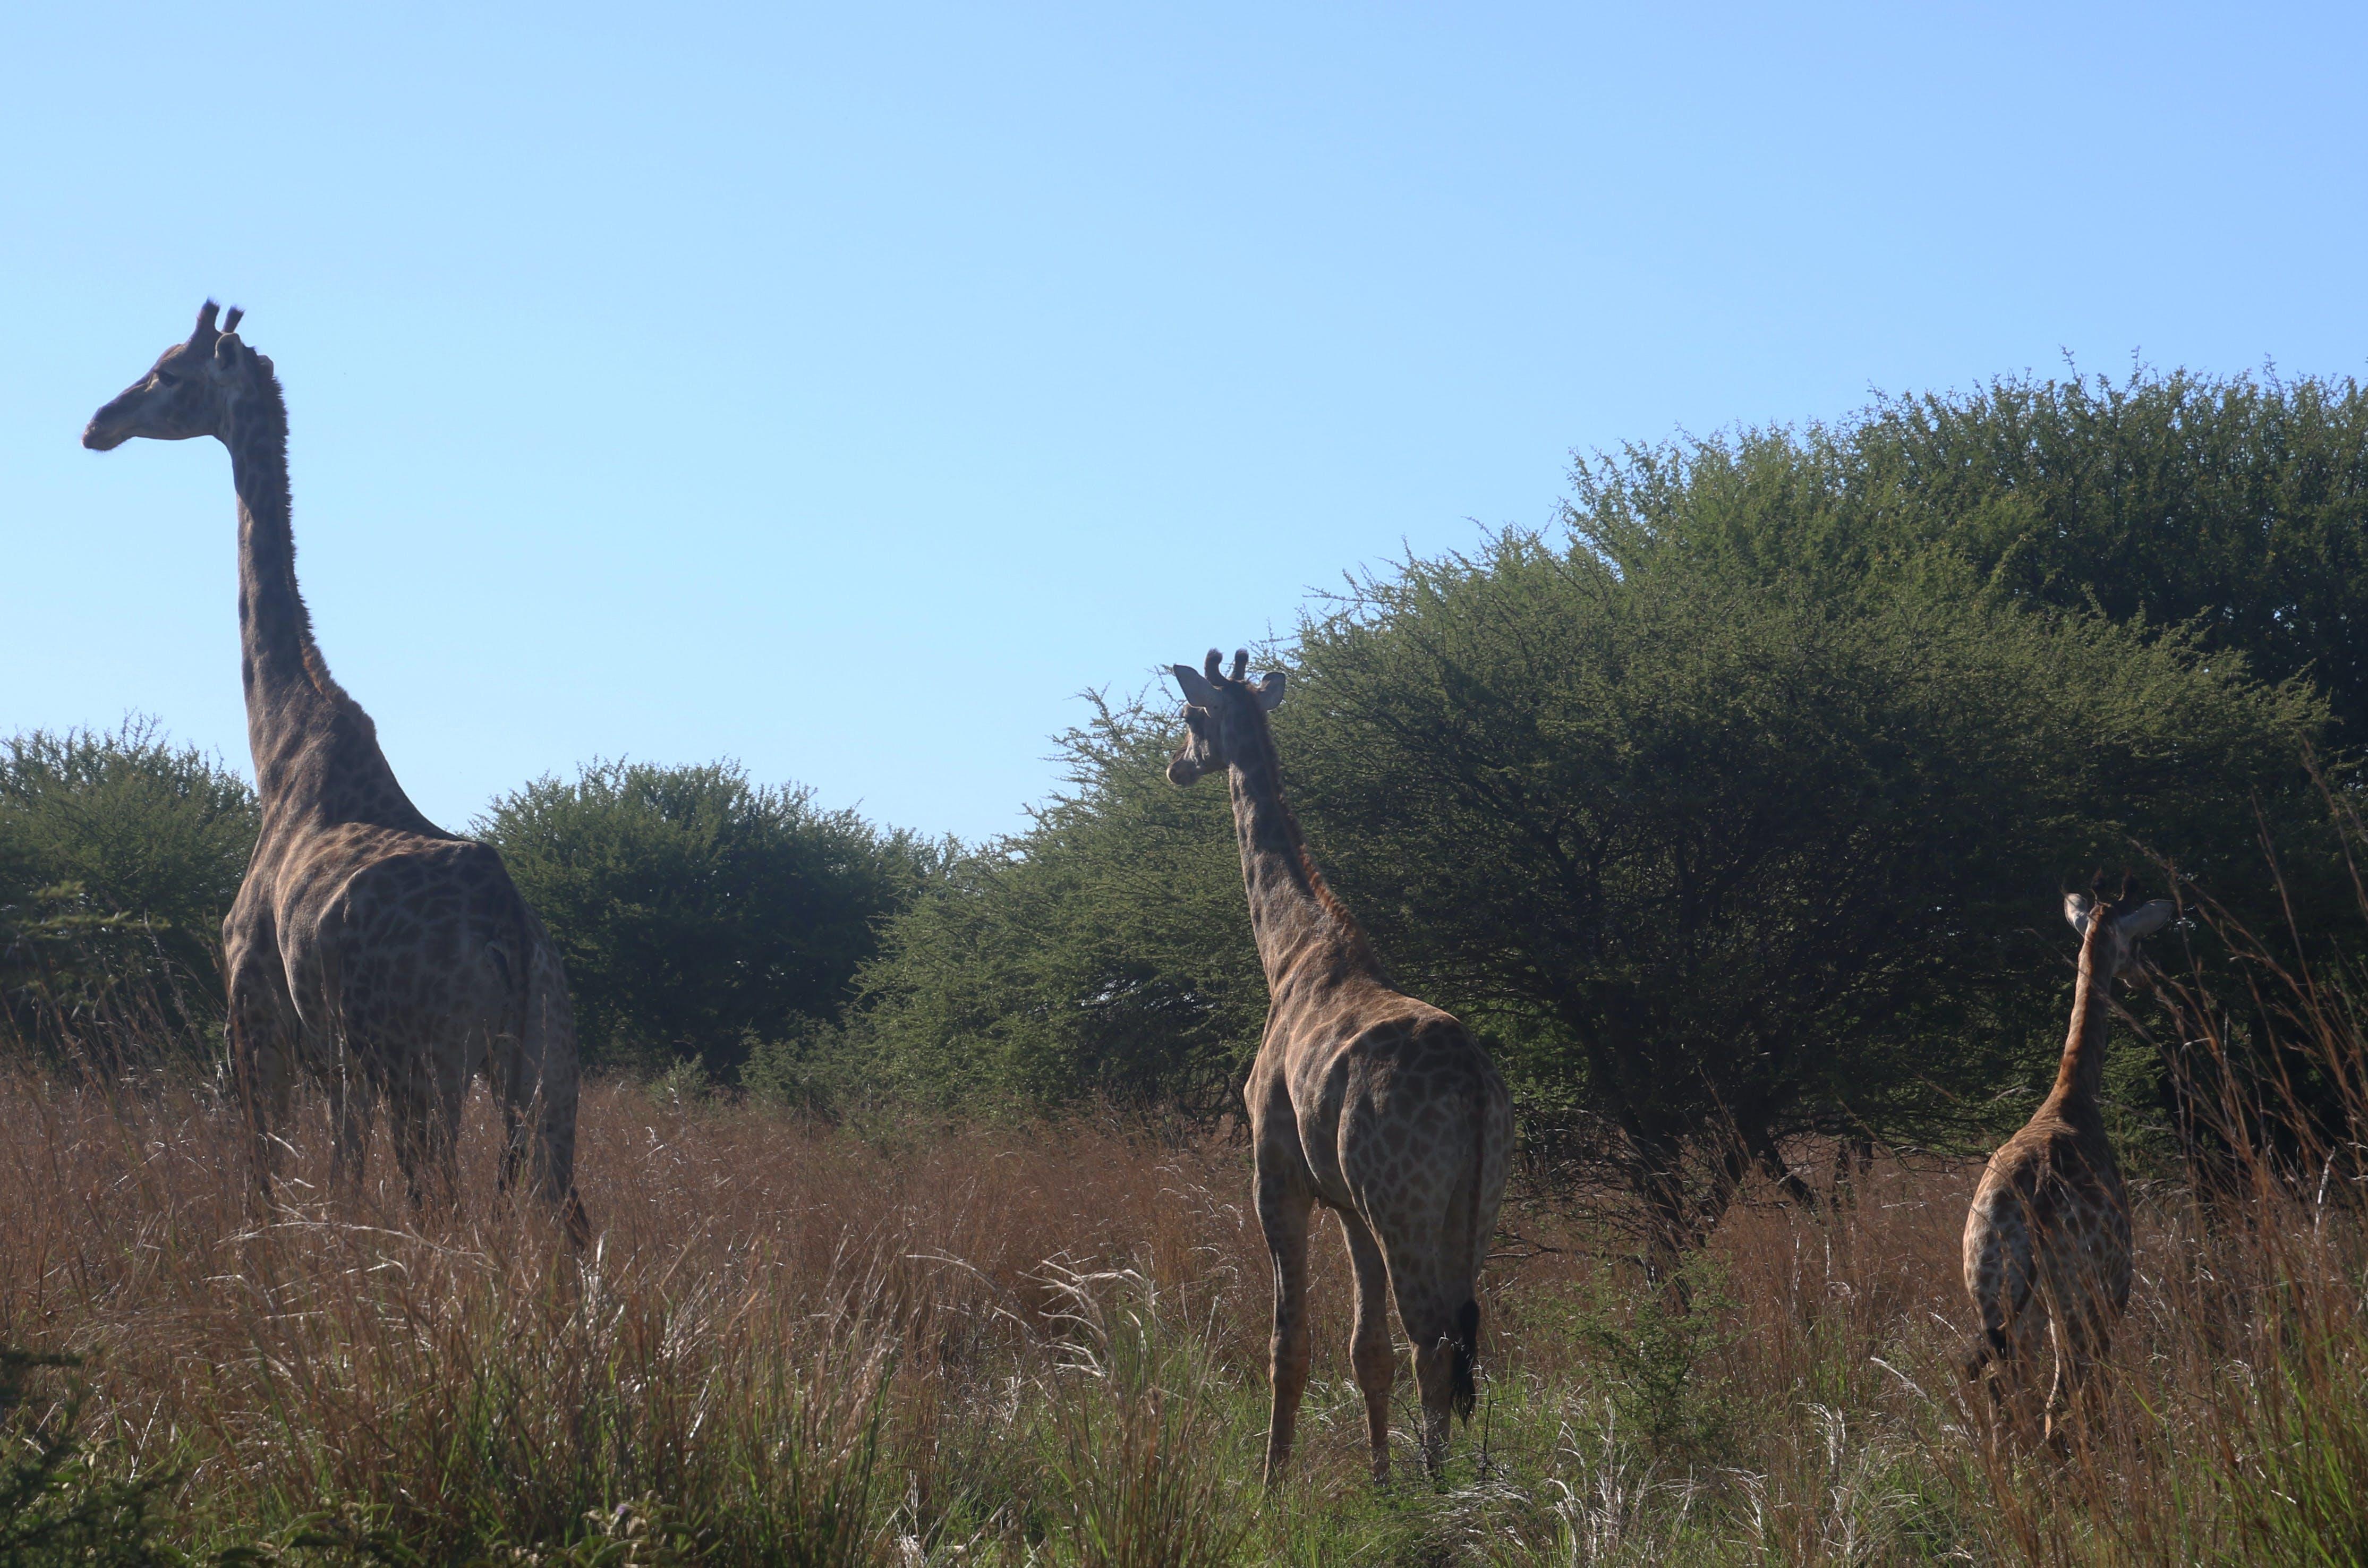 Photo of Giraffes on the Field